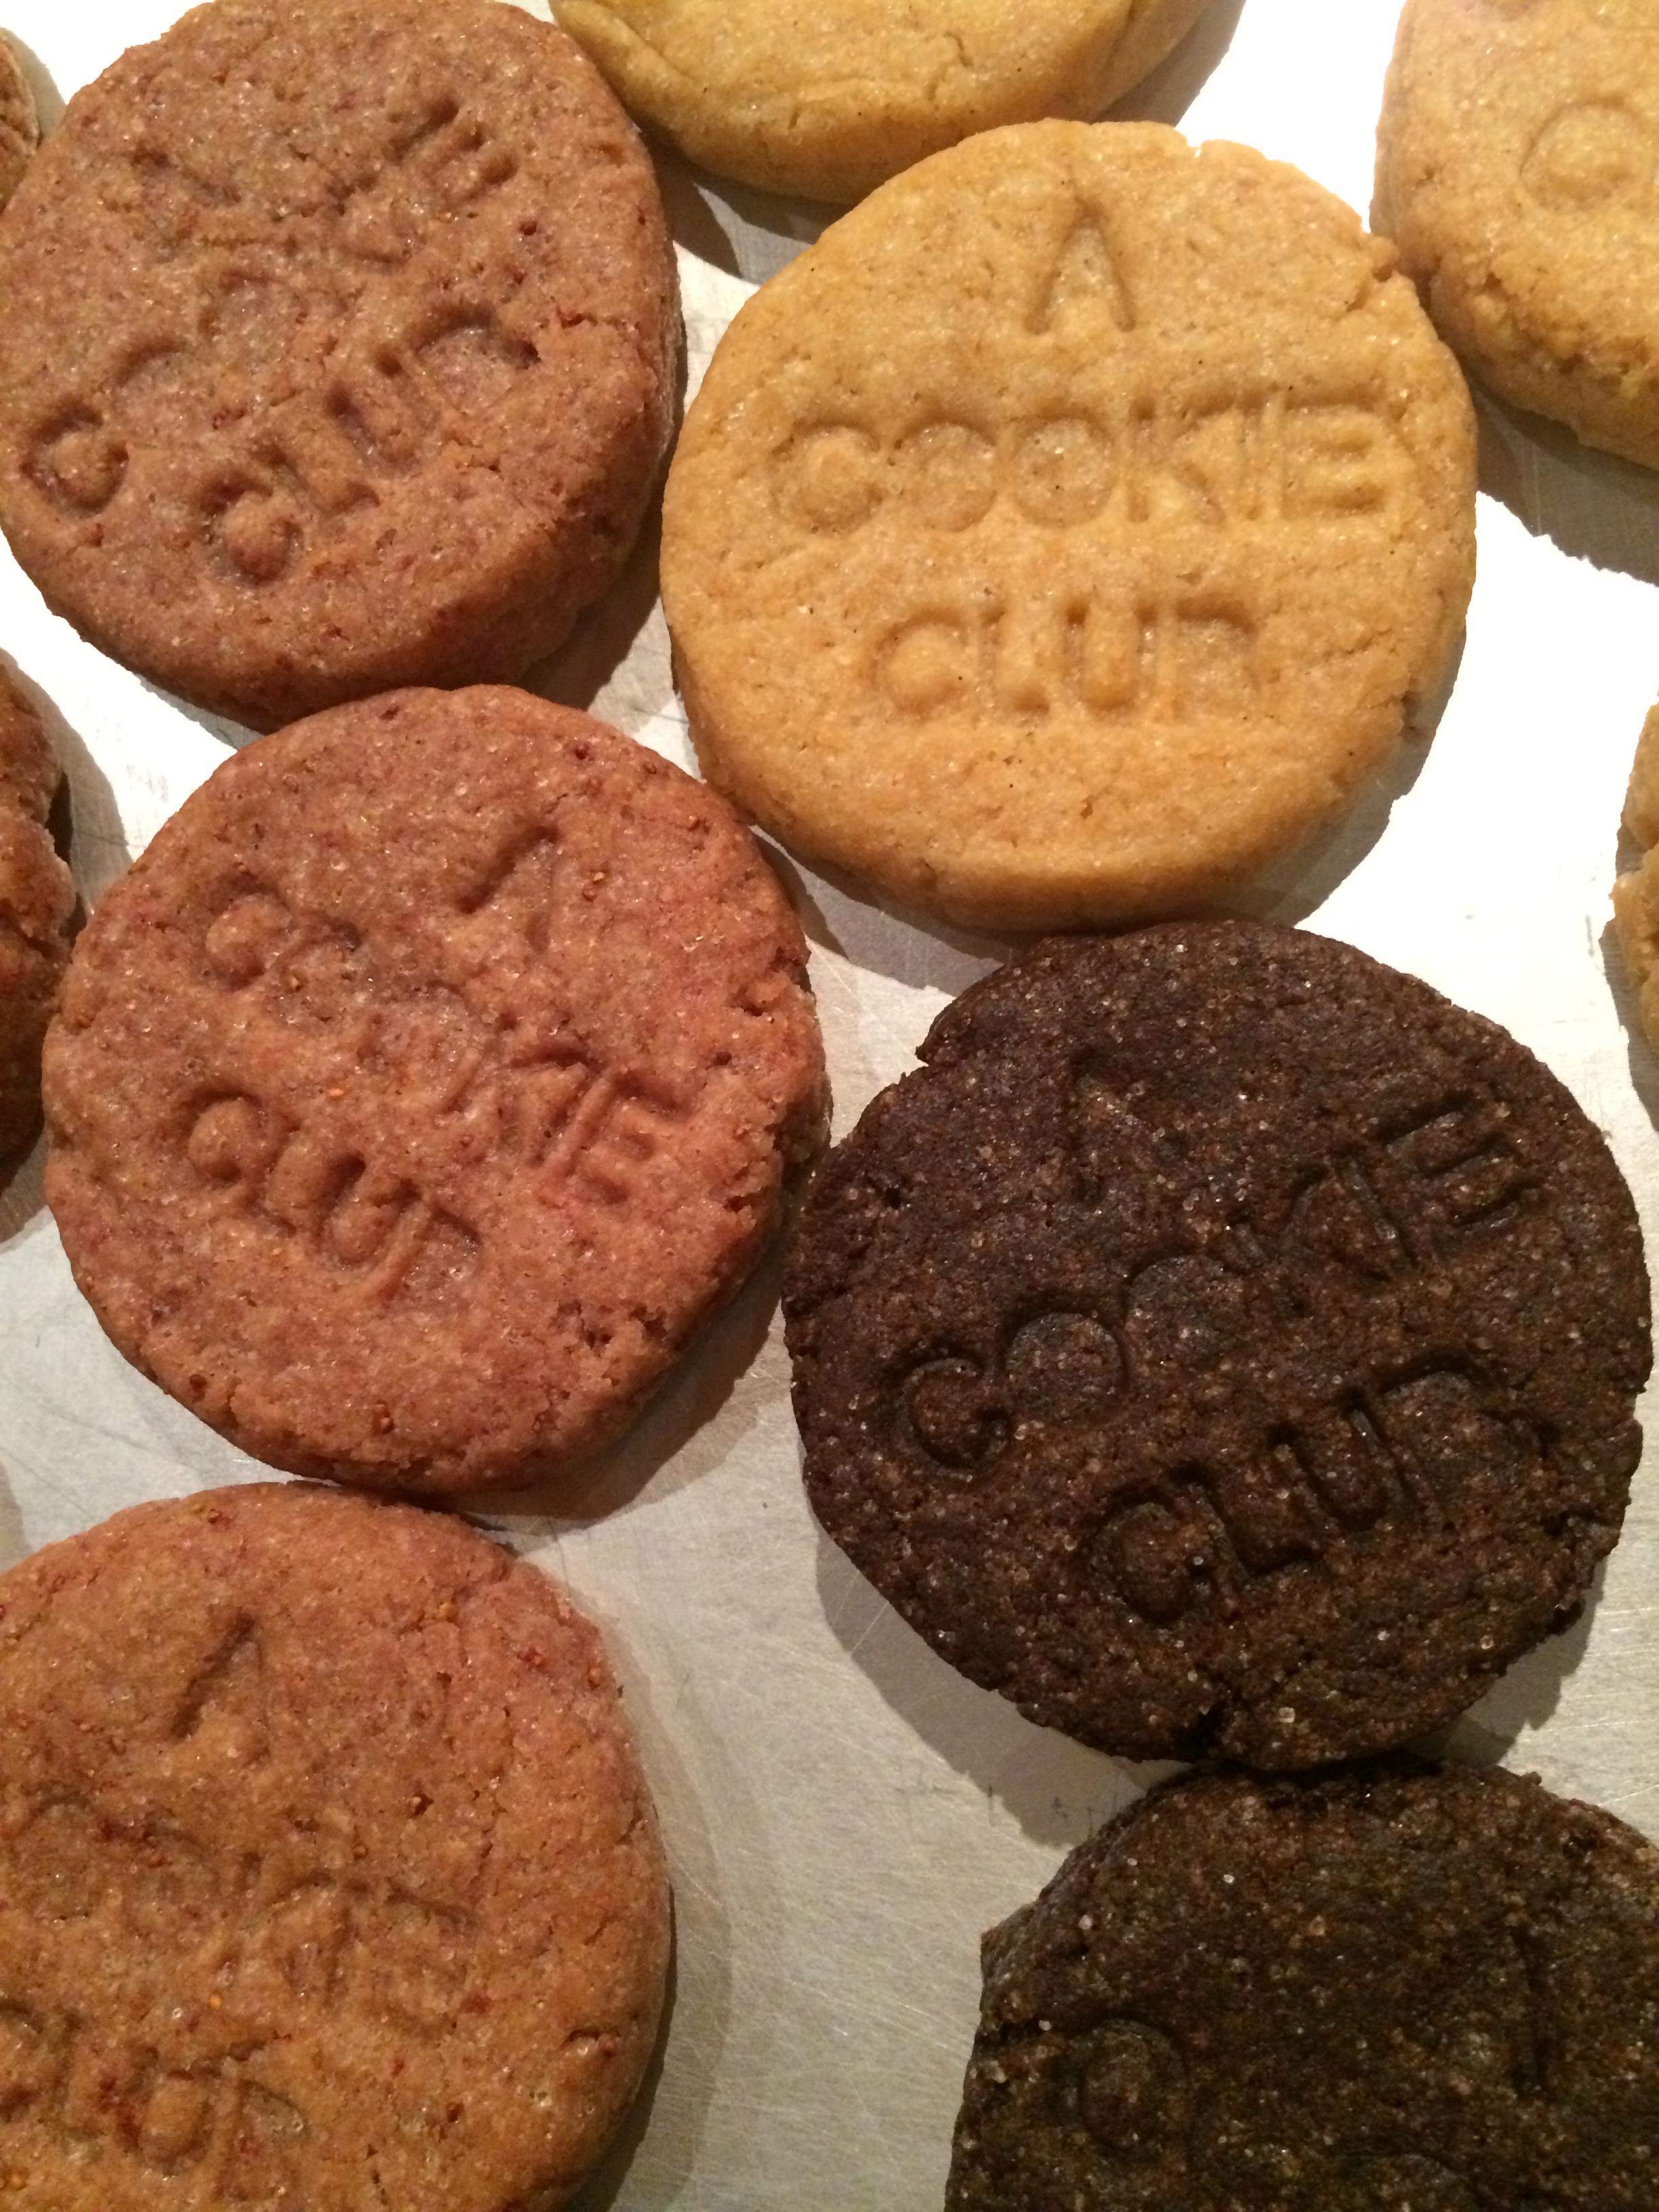 original flavors new look with A COOKIE CLUB logo stamp - strawberry / vanilla / chocolate VEGAN / GLUTENFREE july 2014